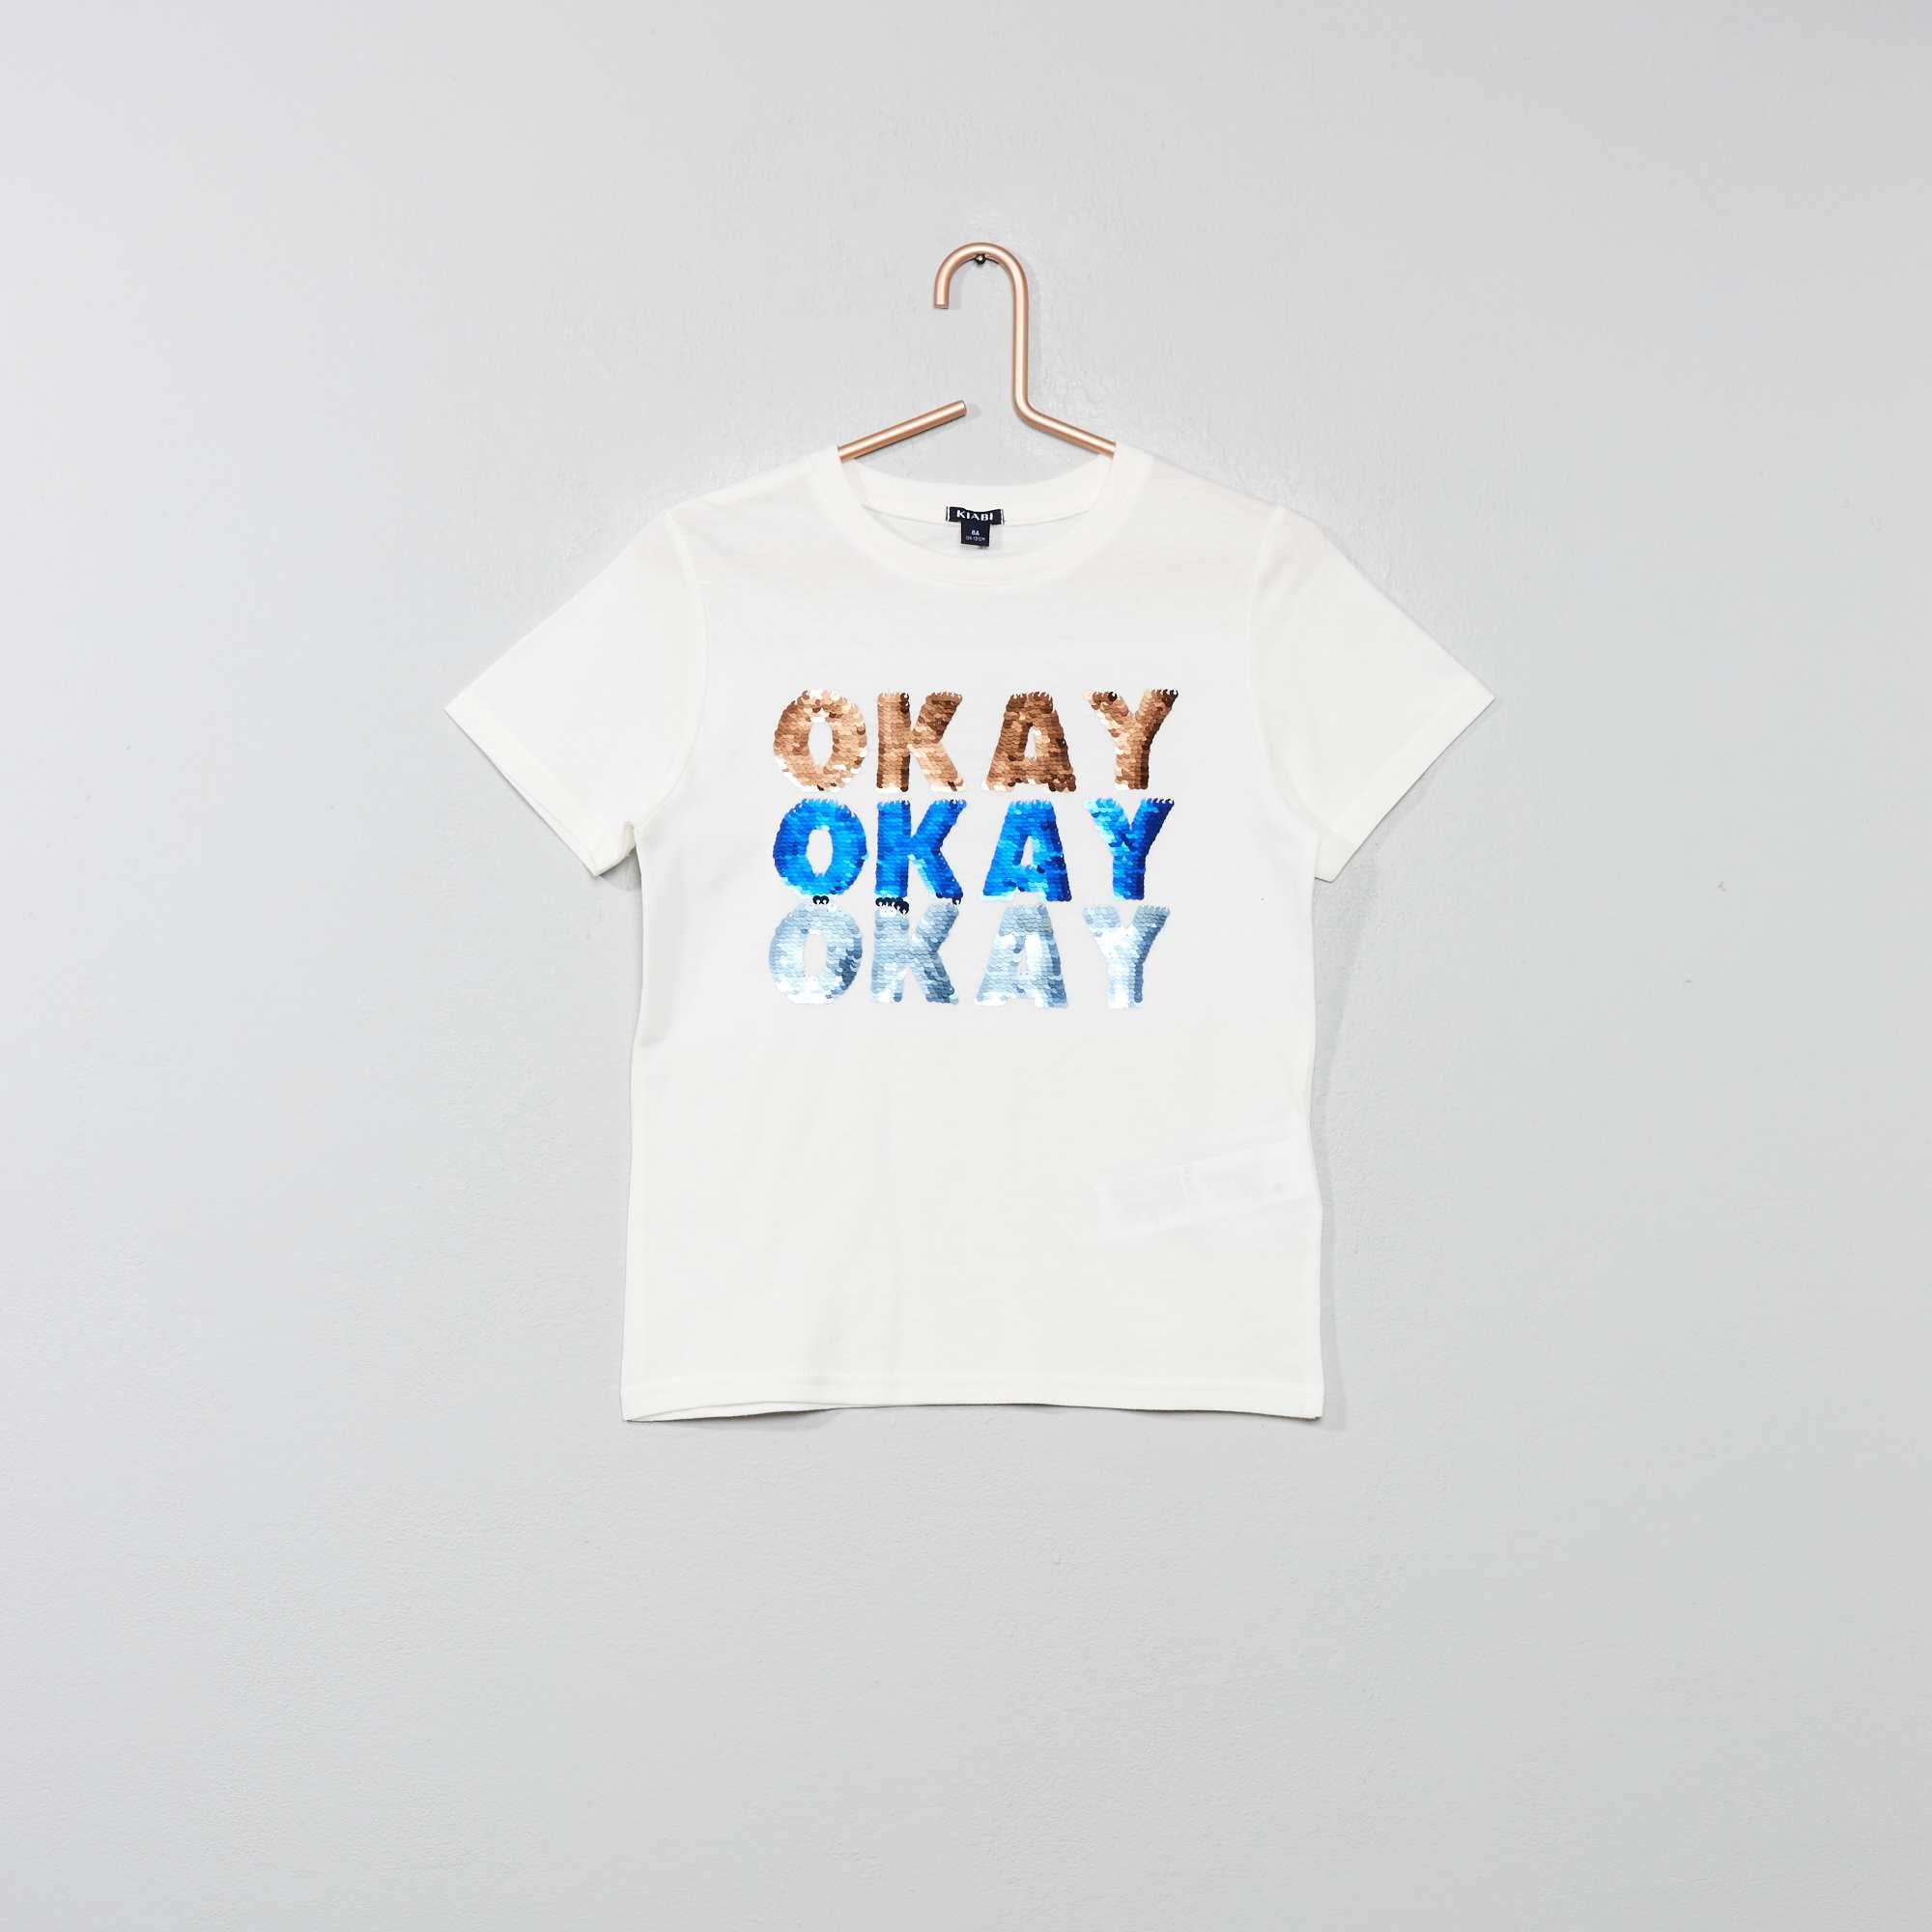 6a8e66aca Camiseta con mensaje con lentejuelas reversibles Chico - BLANCO ...